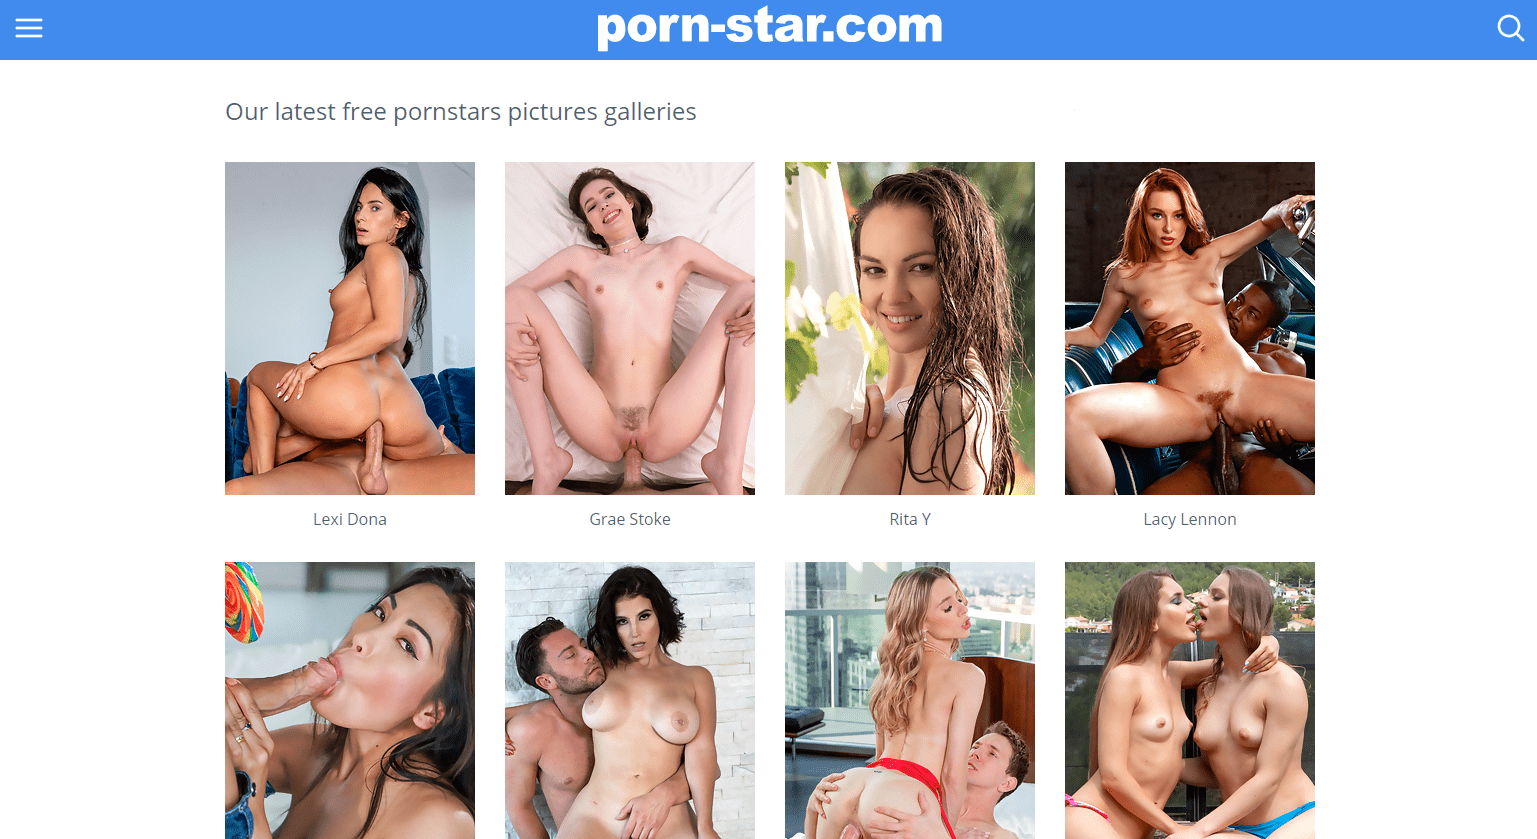 porn-star, Porn-Star